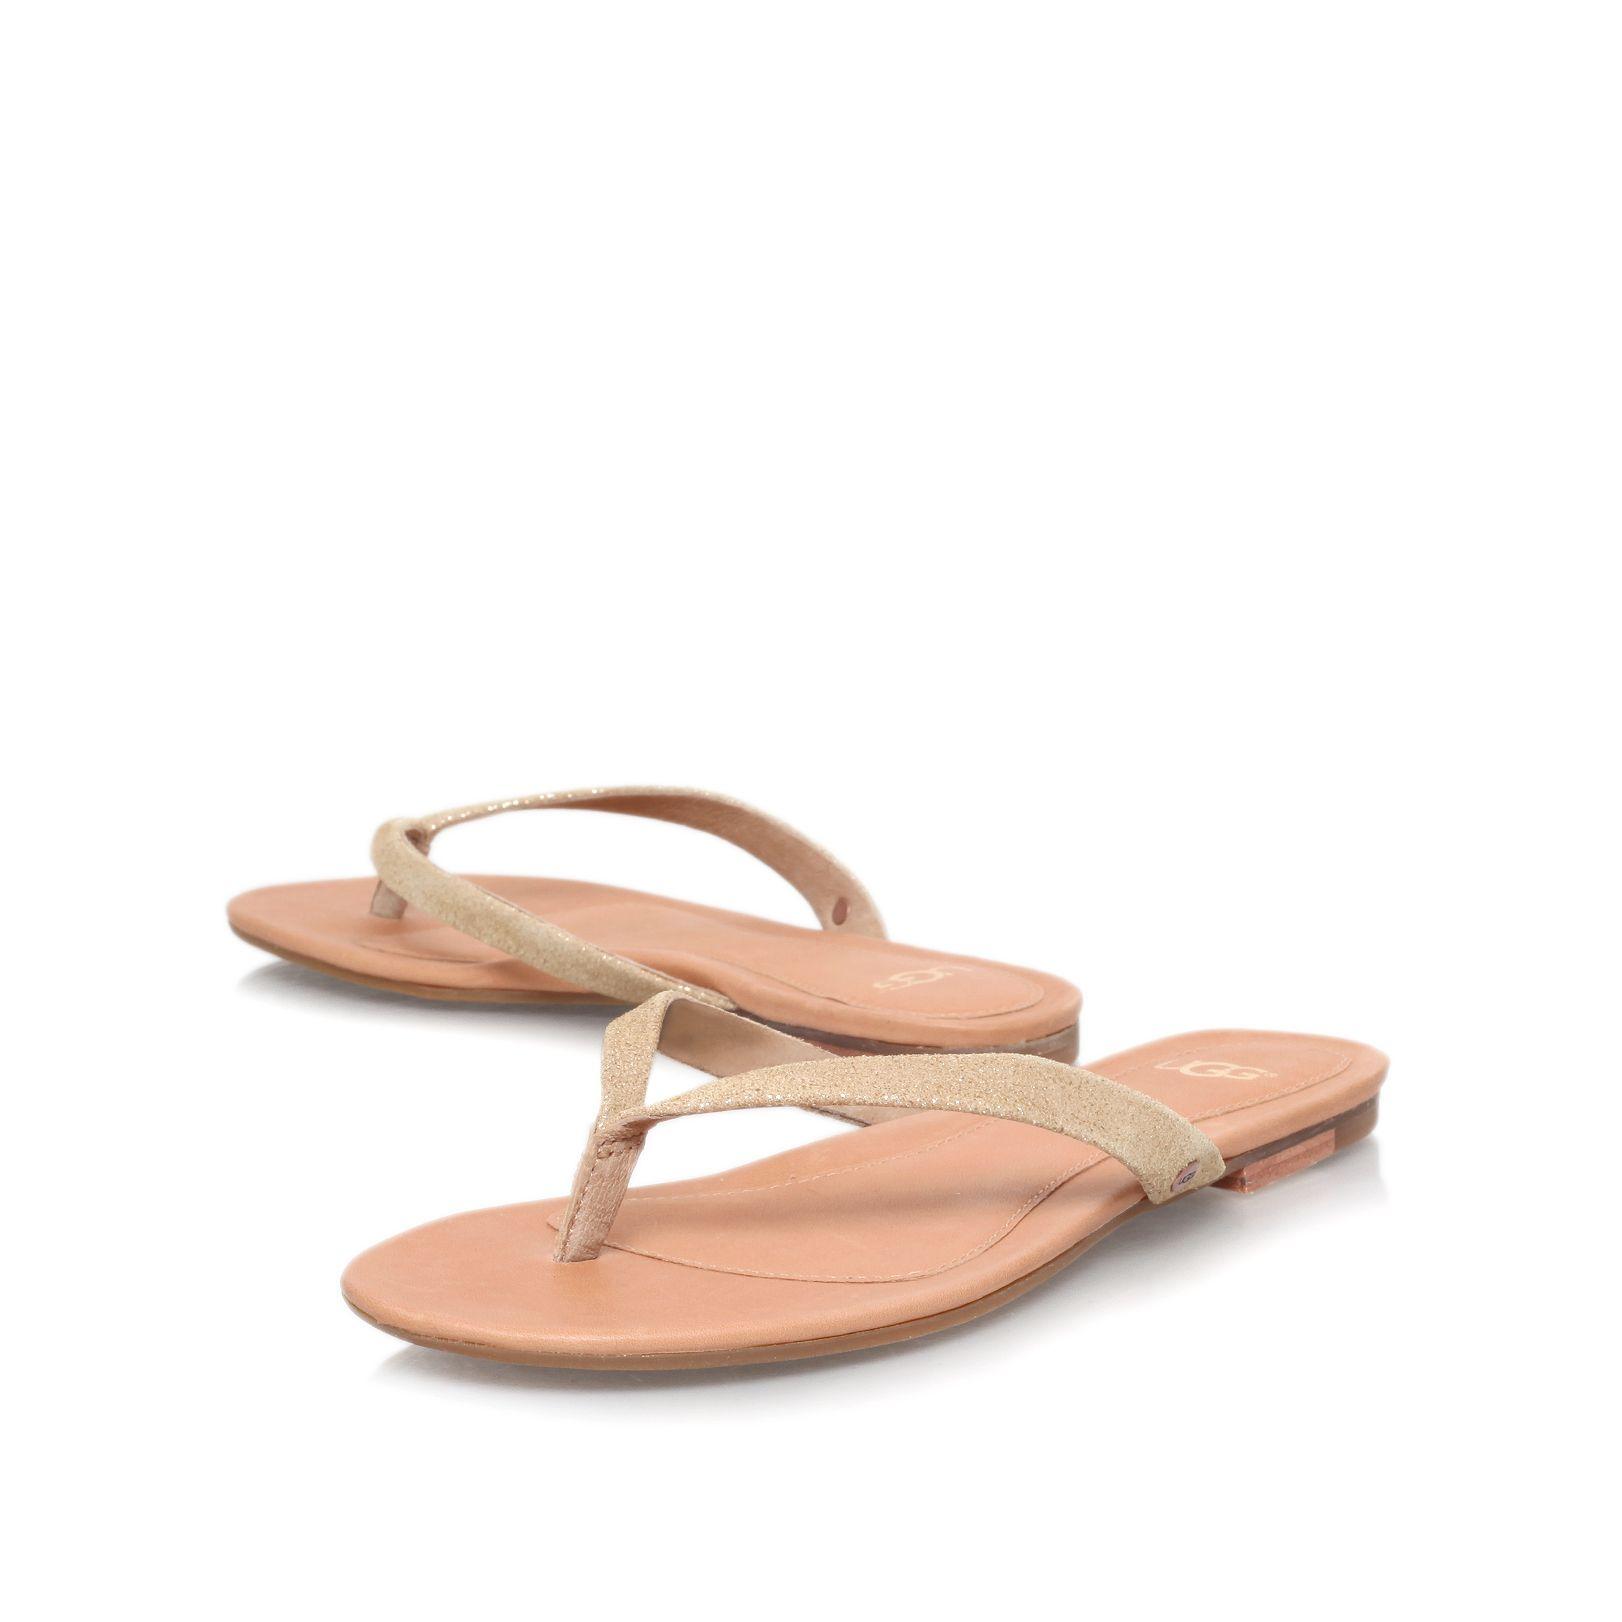 914d244c120c Ugg Slippers Toe Post